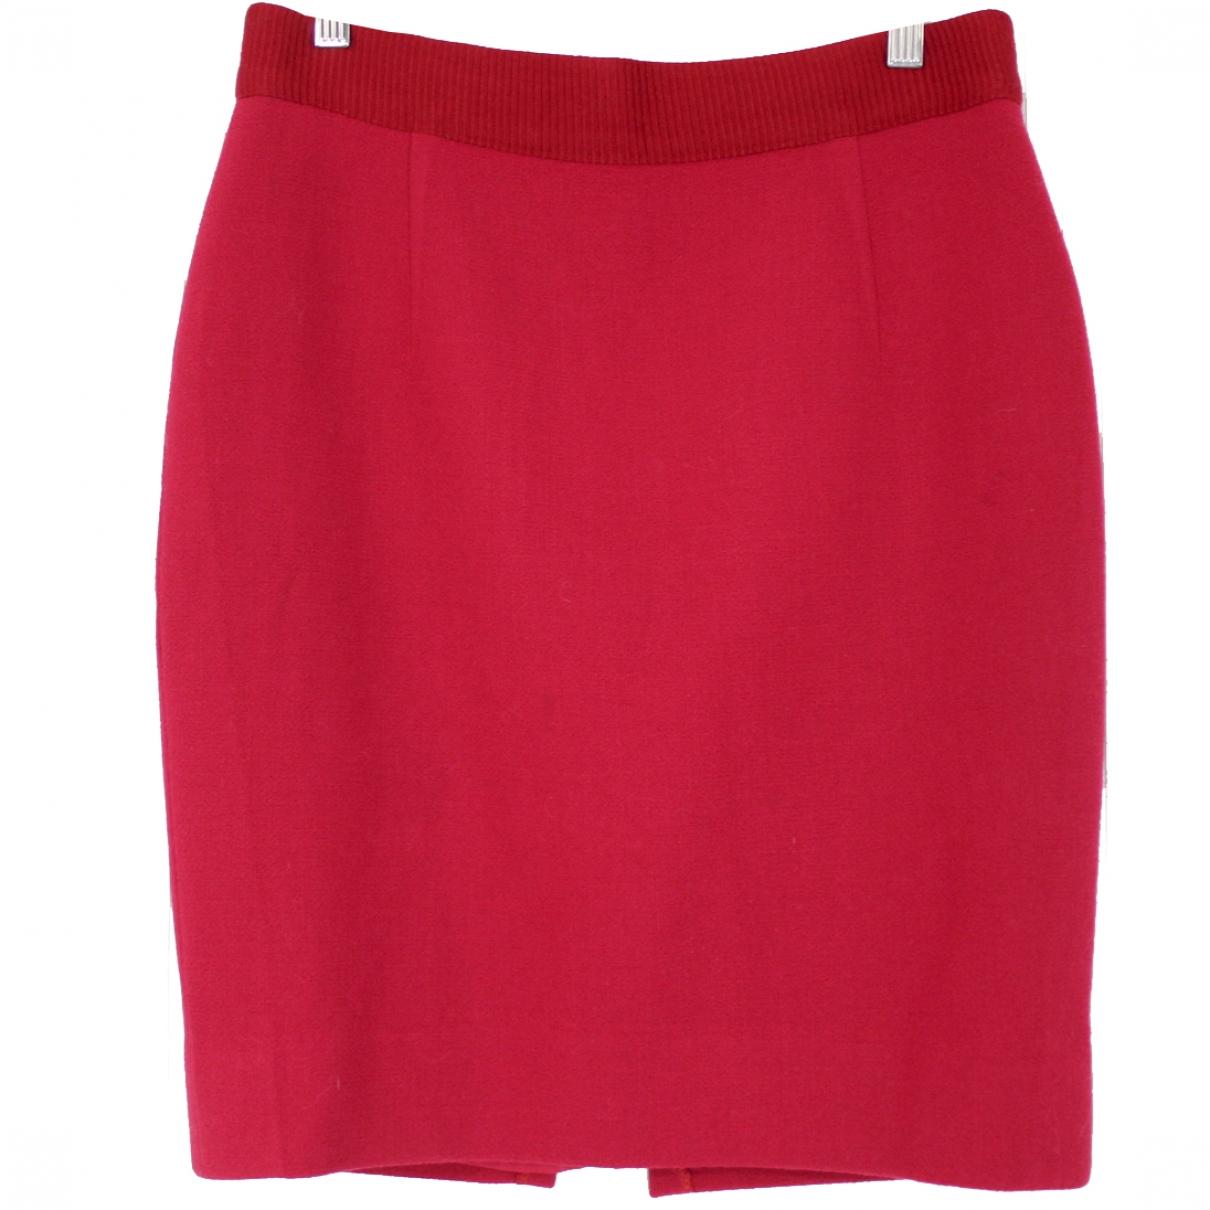 Giambattista Valli \N Red Wool skirt for Women L International